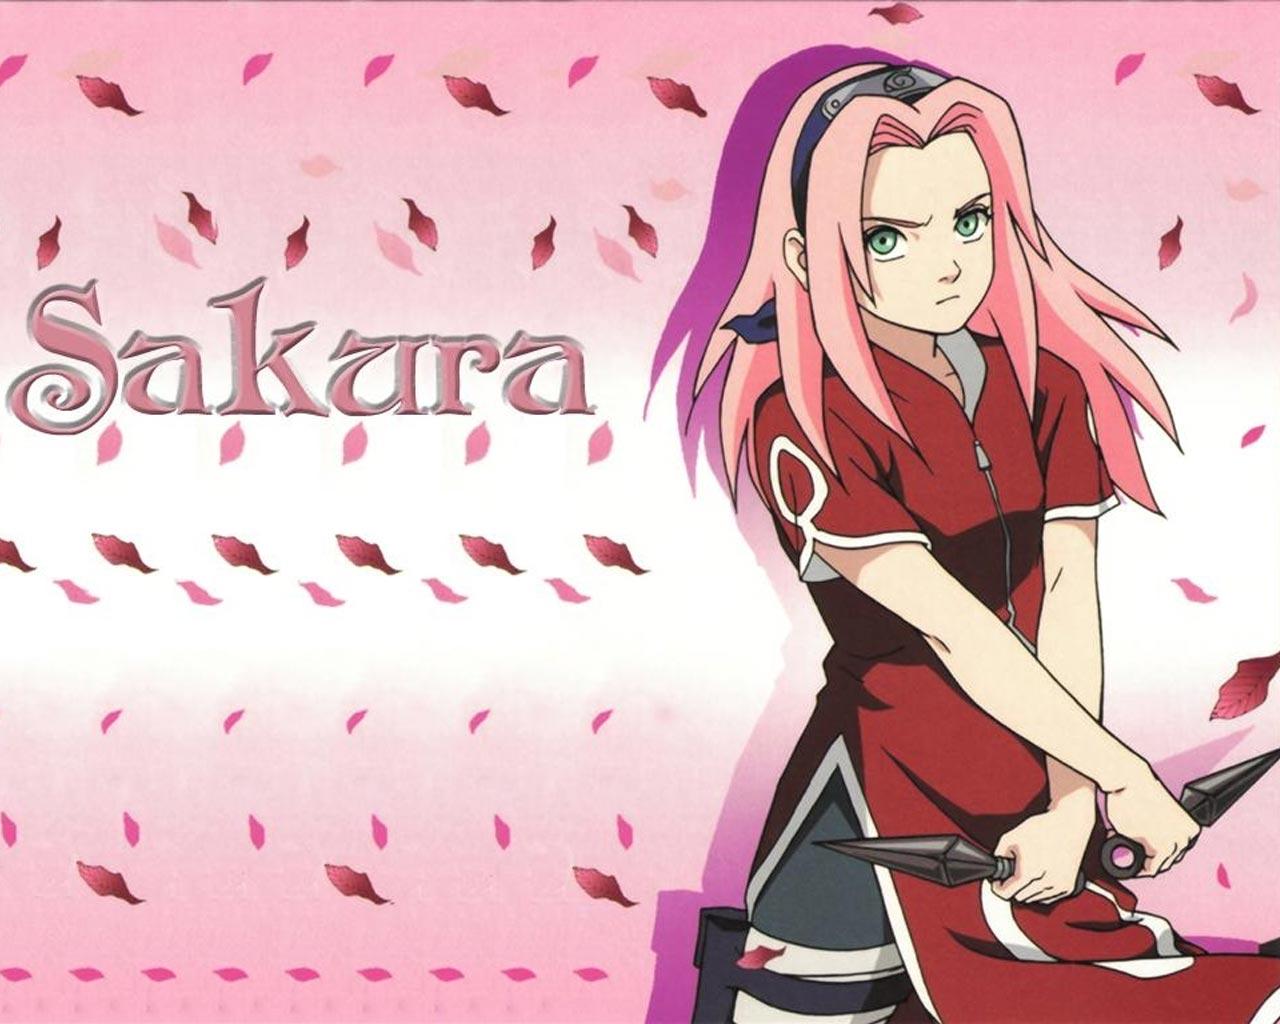 73 Naruto And Sakura Wallpaper On Wallpapersafari